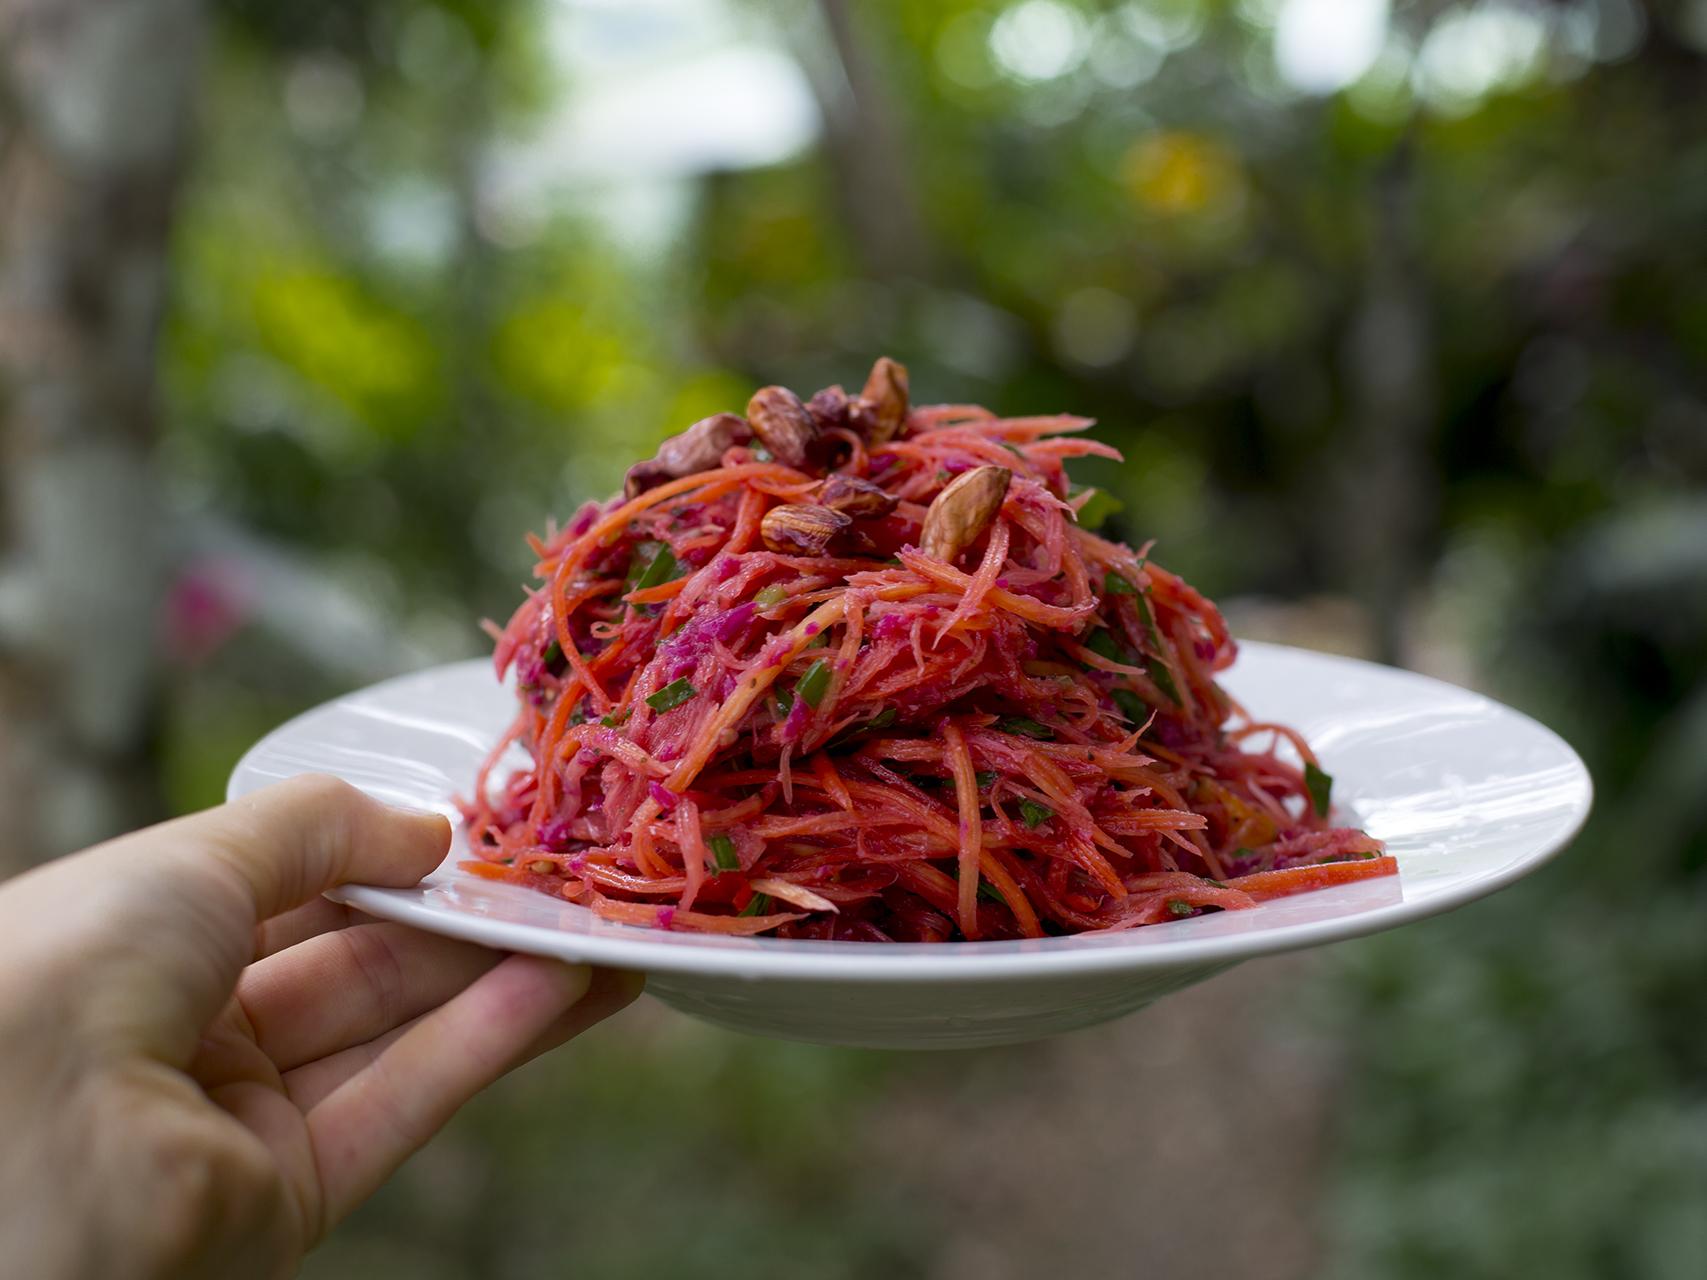 Papayasalat rohkost und vegan aus Bali mit Sauerkraut.